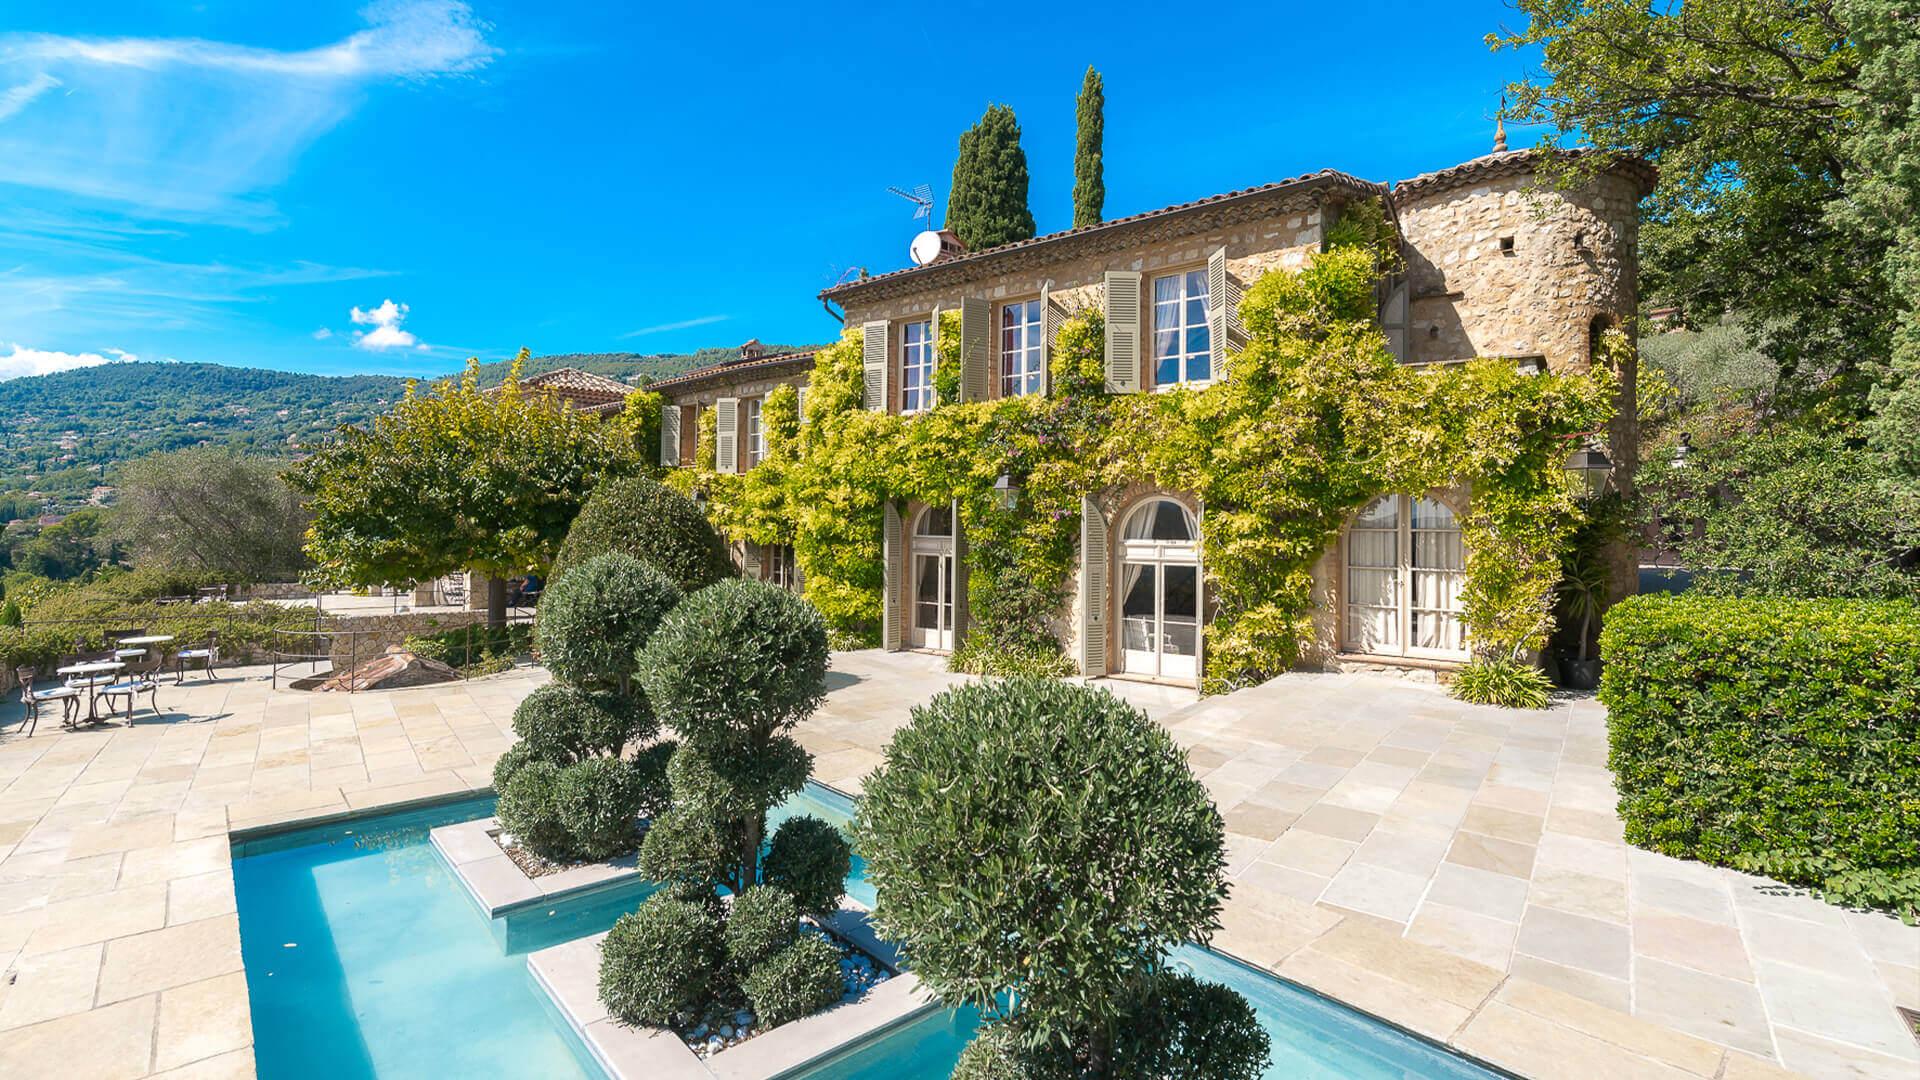 Bastide Provencale front of villa with fountain